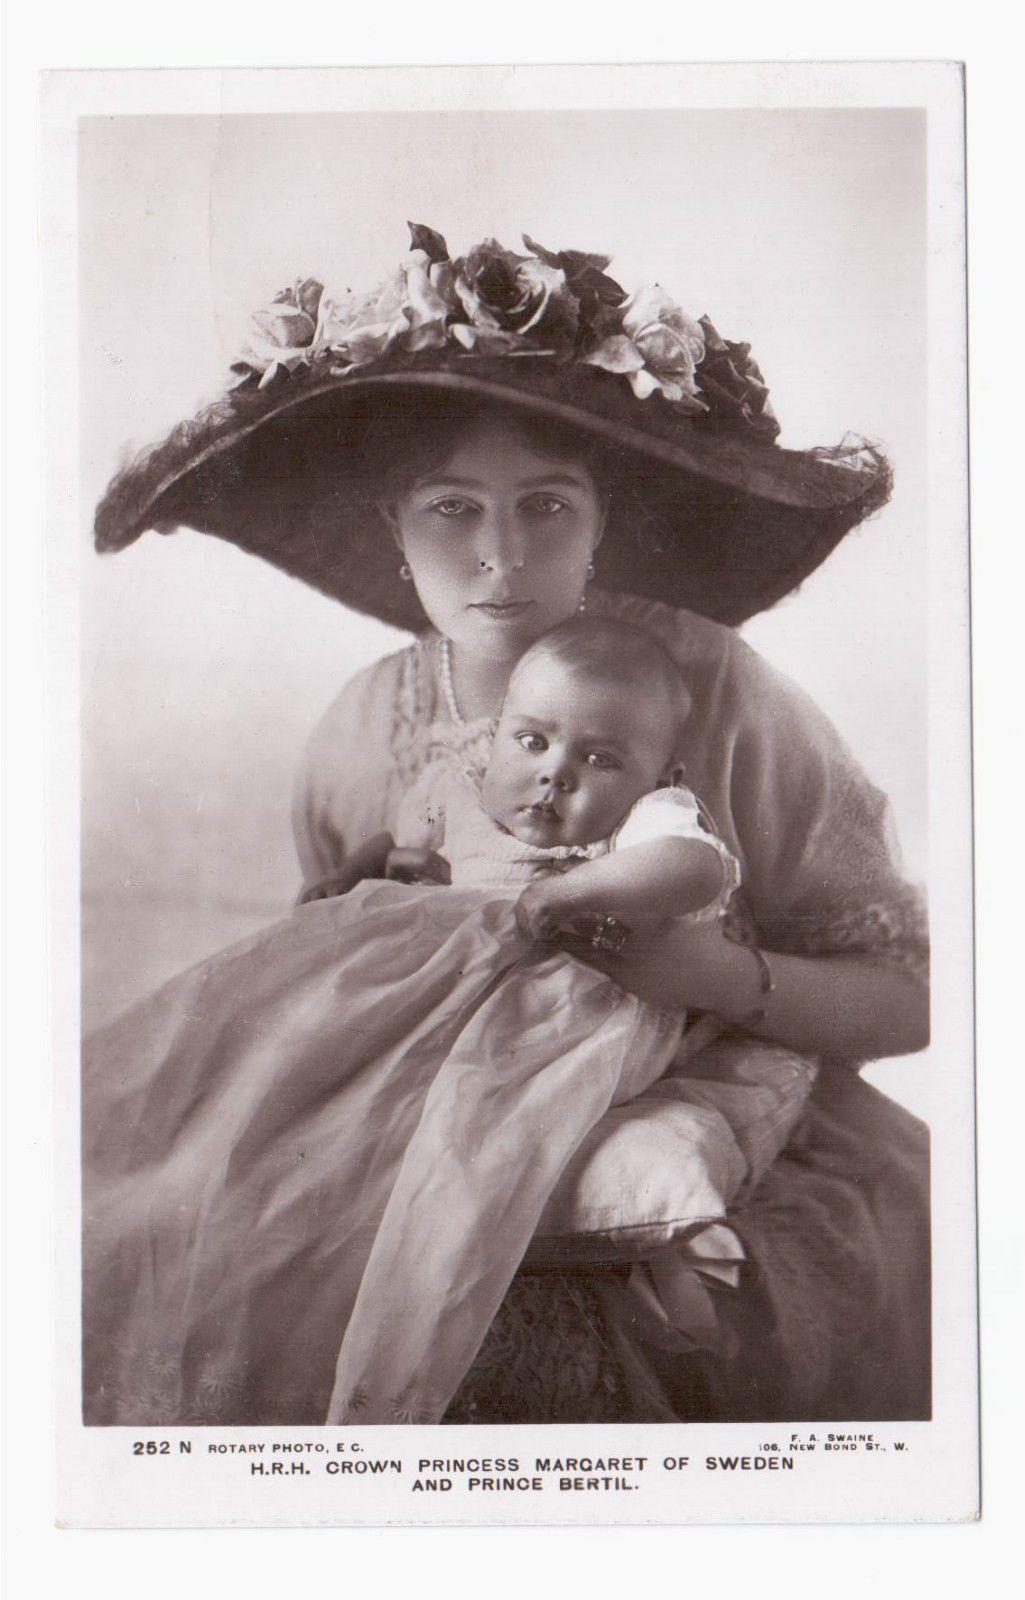 Crown Princess Margaret of Sweden Connaught and Prince Bertil